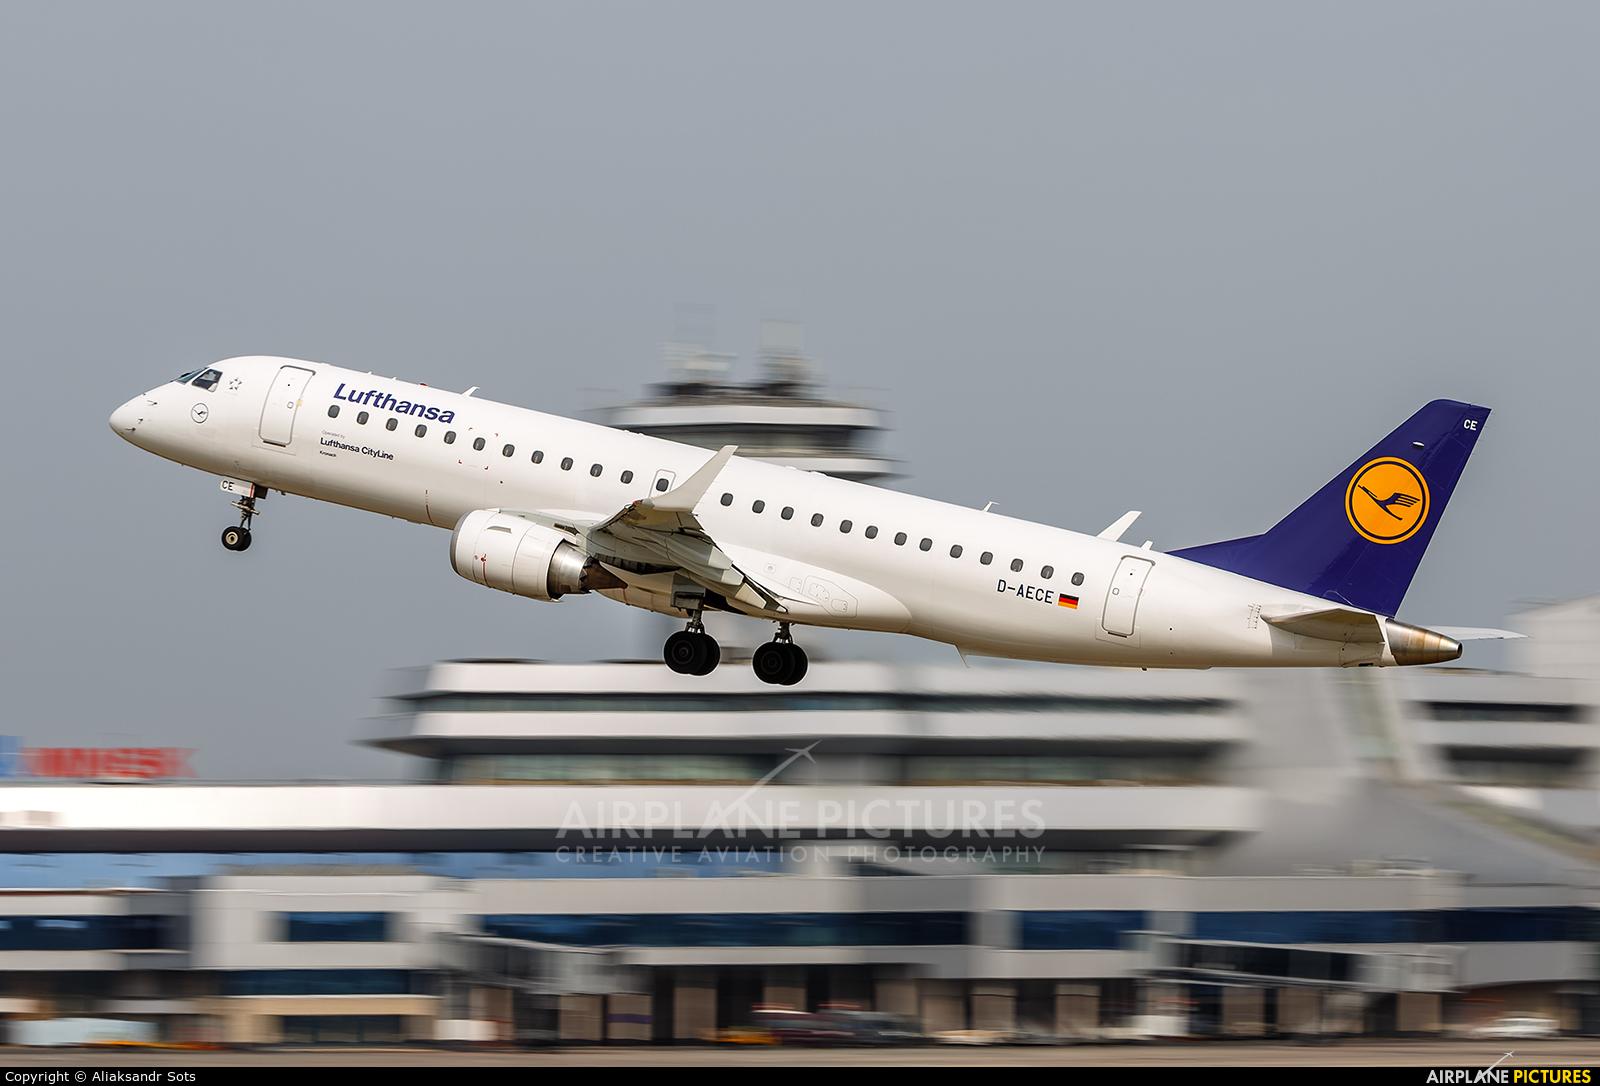 Lufthansa Regional - CityLine D-AECE aircraft at Minsk Intl